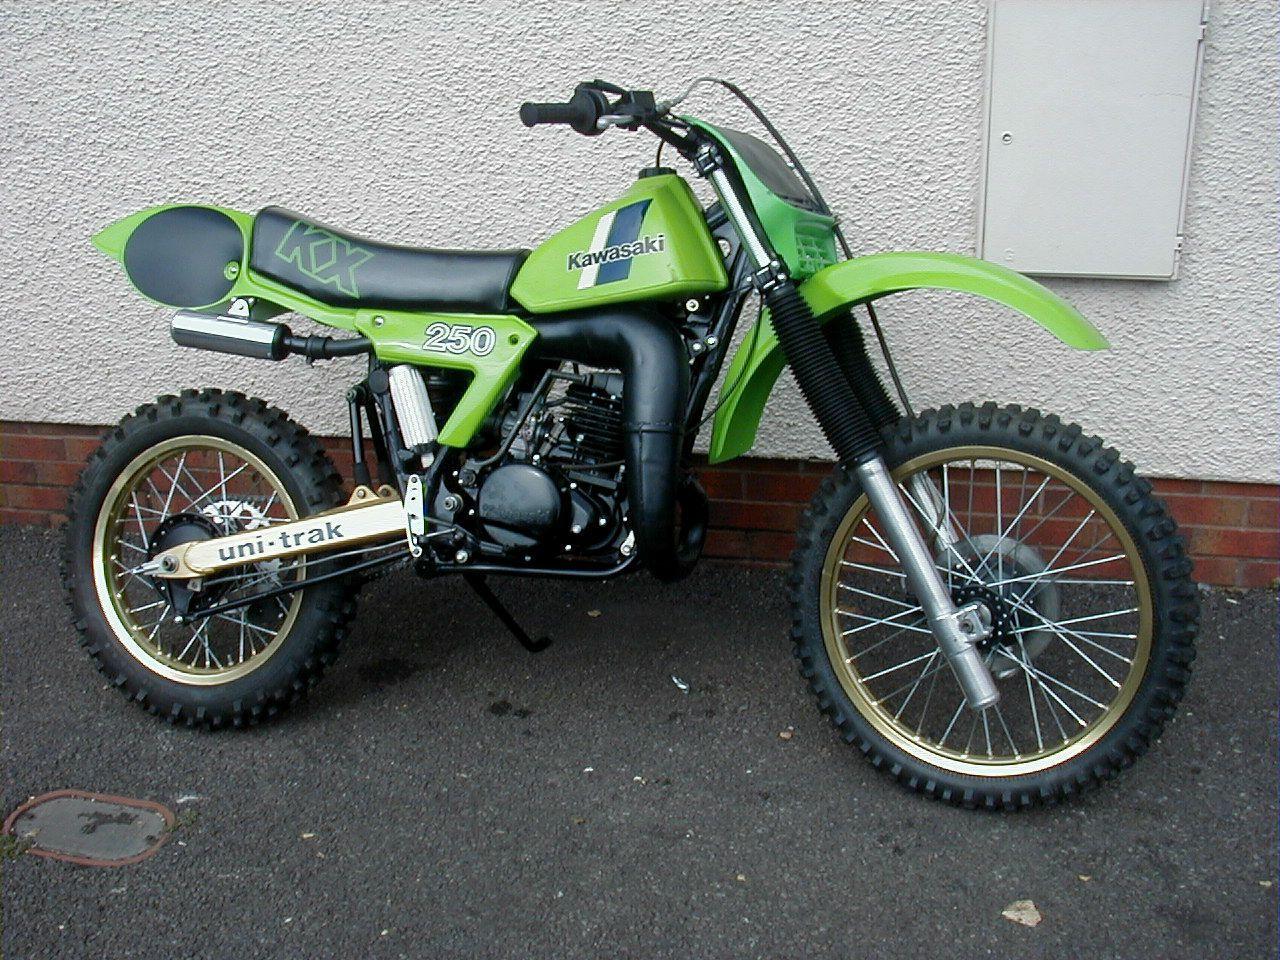 1982 Kawasaki KX250 * Kawasaki kx 250, Motorcycle, Motocross